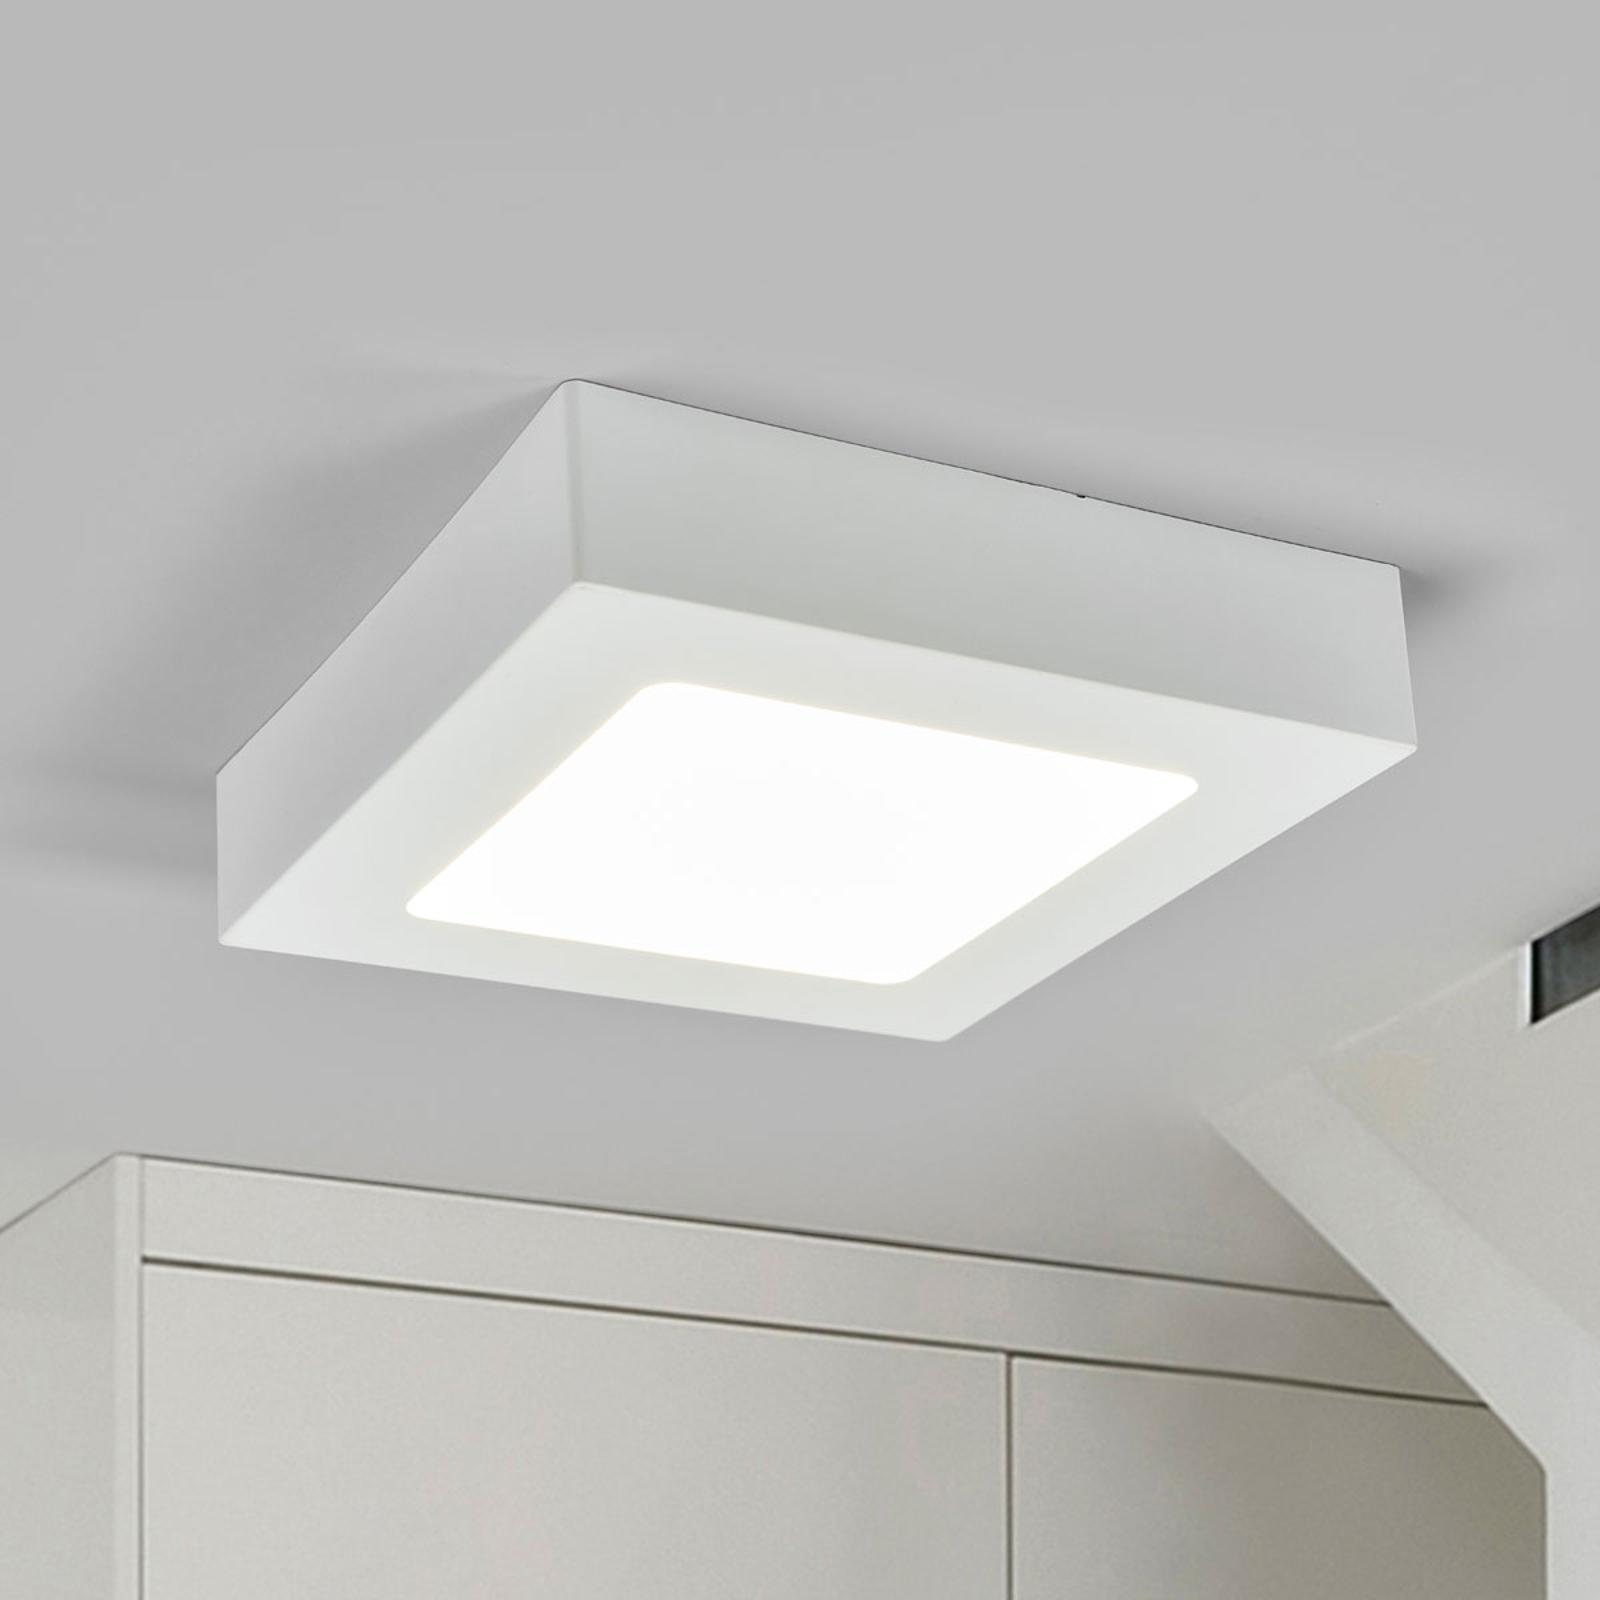 LED-loftlampe Marlo hvid 4000K kantet 18,1cm